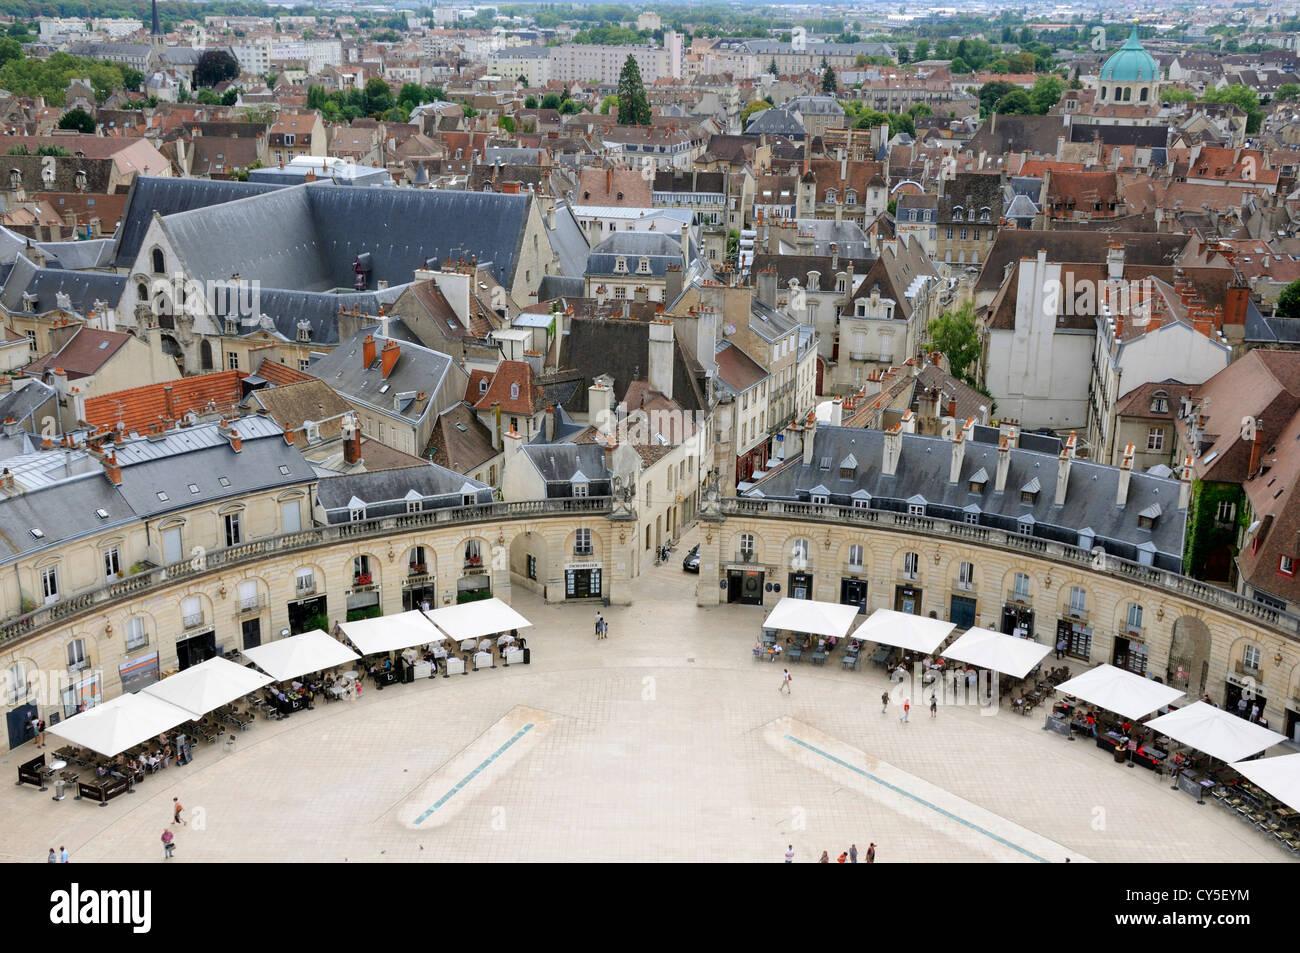 Dijon, France - Place de la Liberation Square with market, from Philippe le Bon Tower Stock Photo